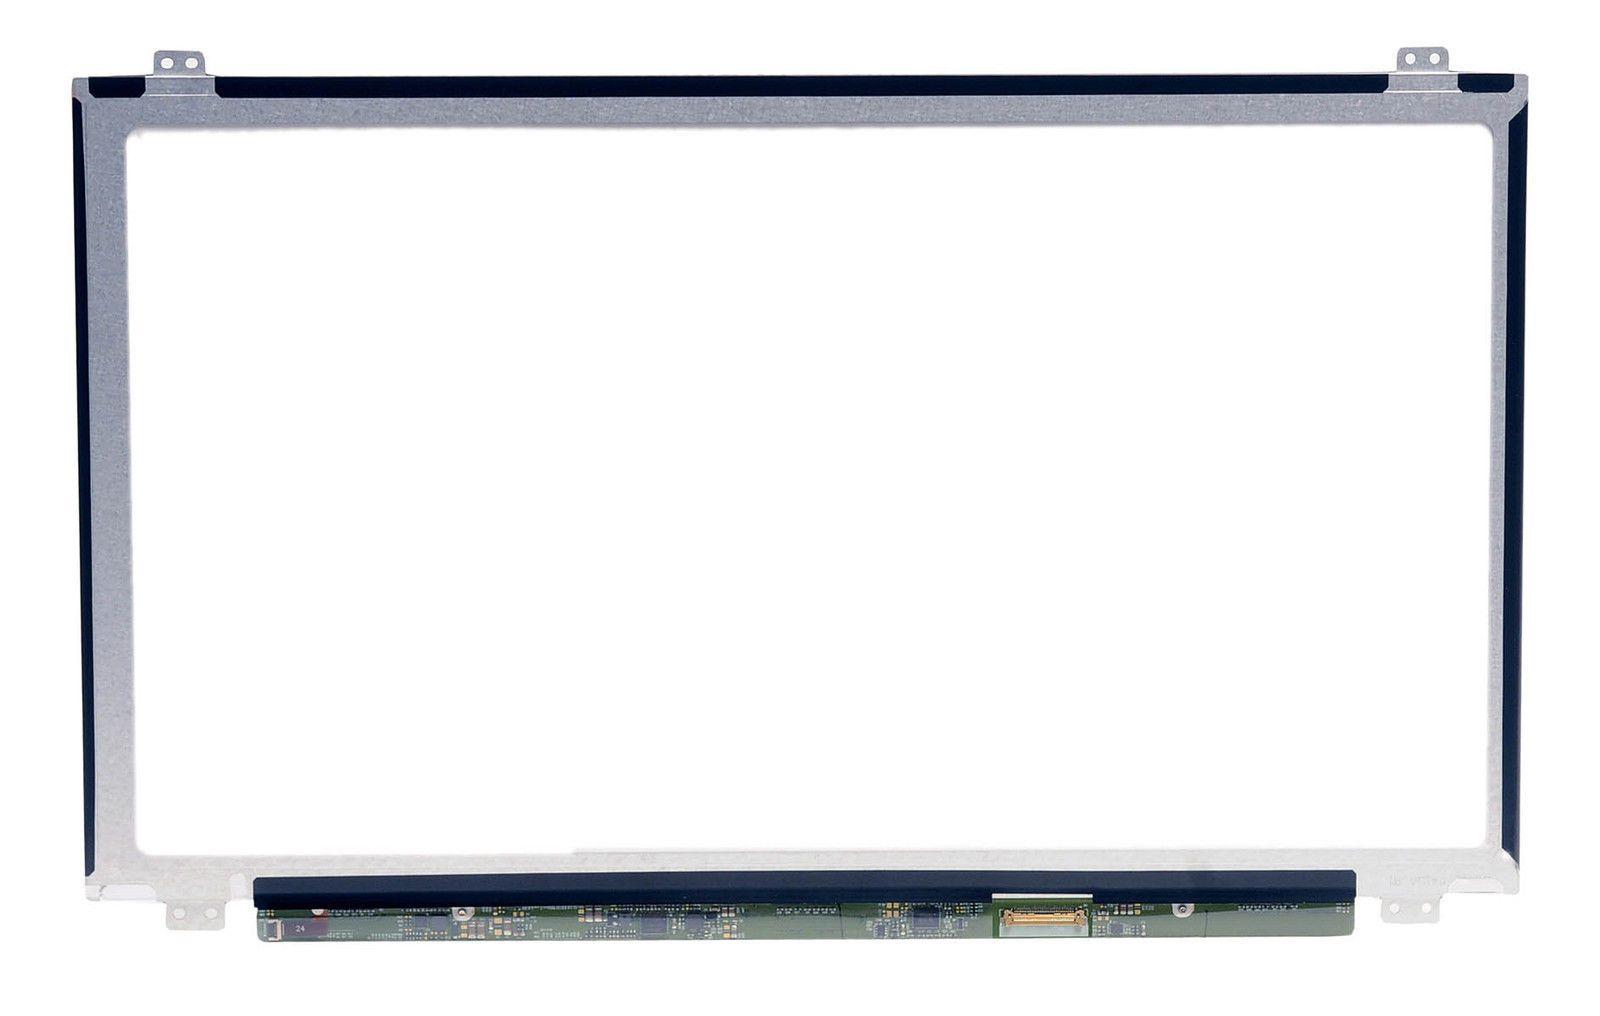 Kl 15605 005 B156xtn03 1 Genuine For Acer 15 6 Aspire V5 571 Slim Lcd Led Screenn Panel Led Display Screen Display Screen Laptop Lcd